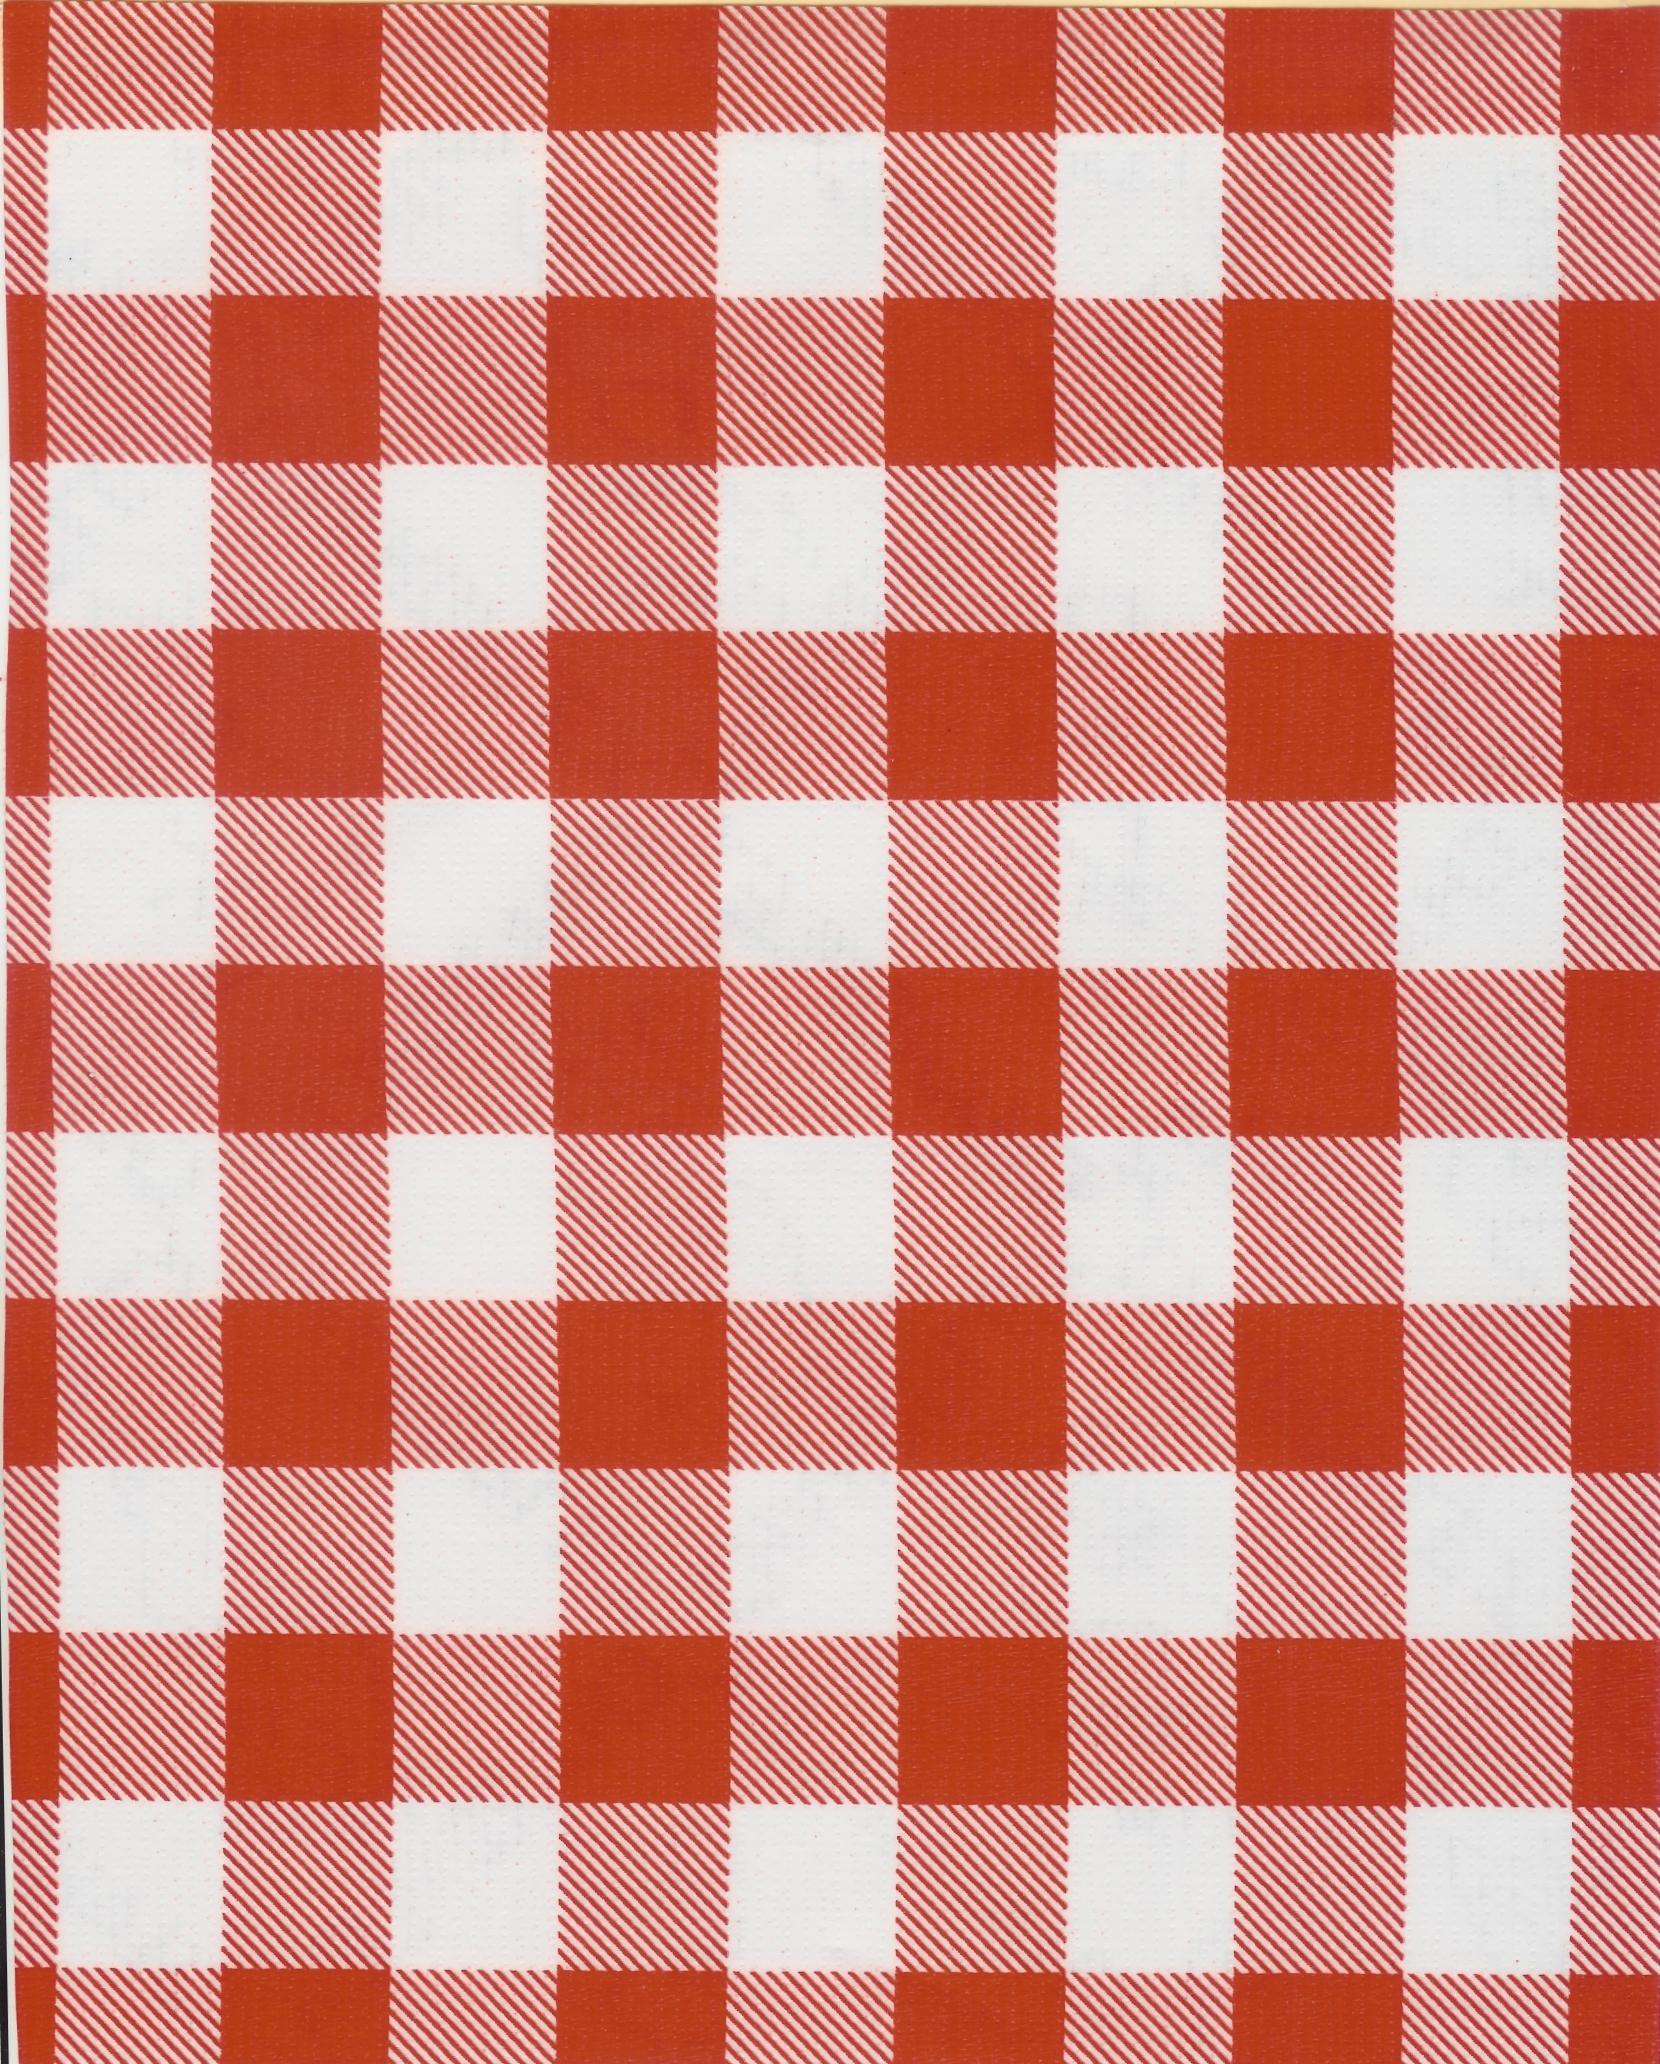 Picnic Check Red